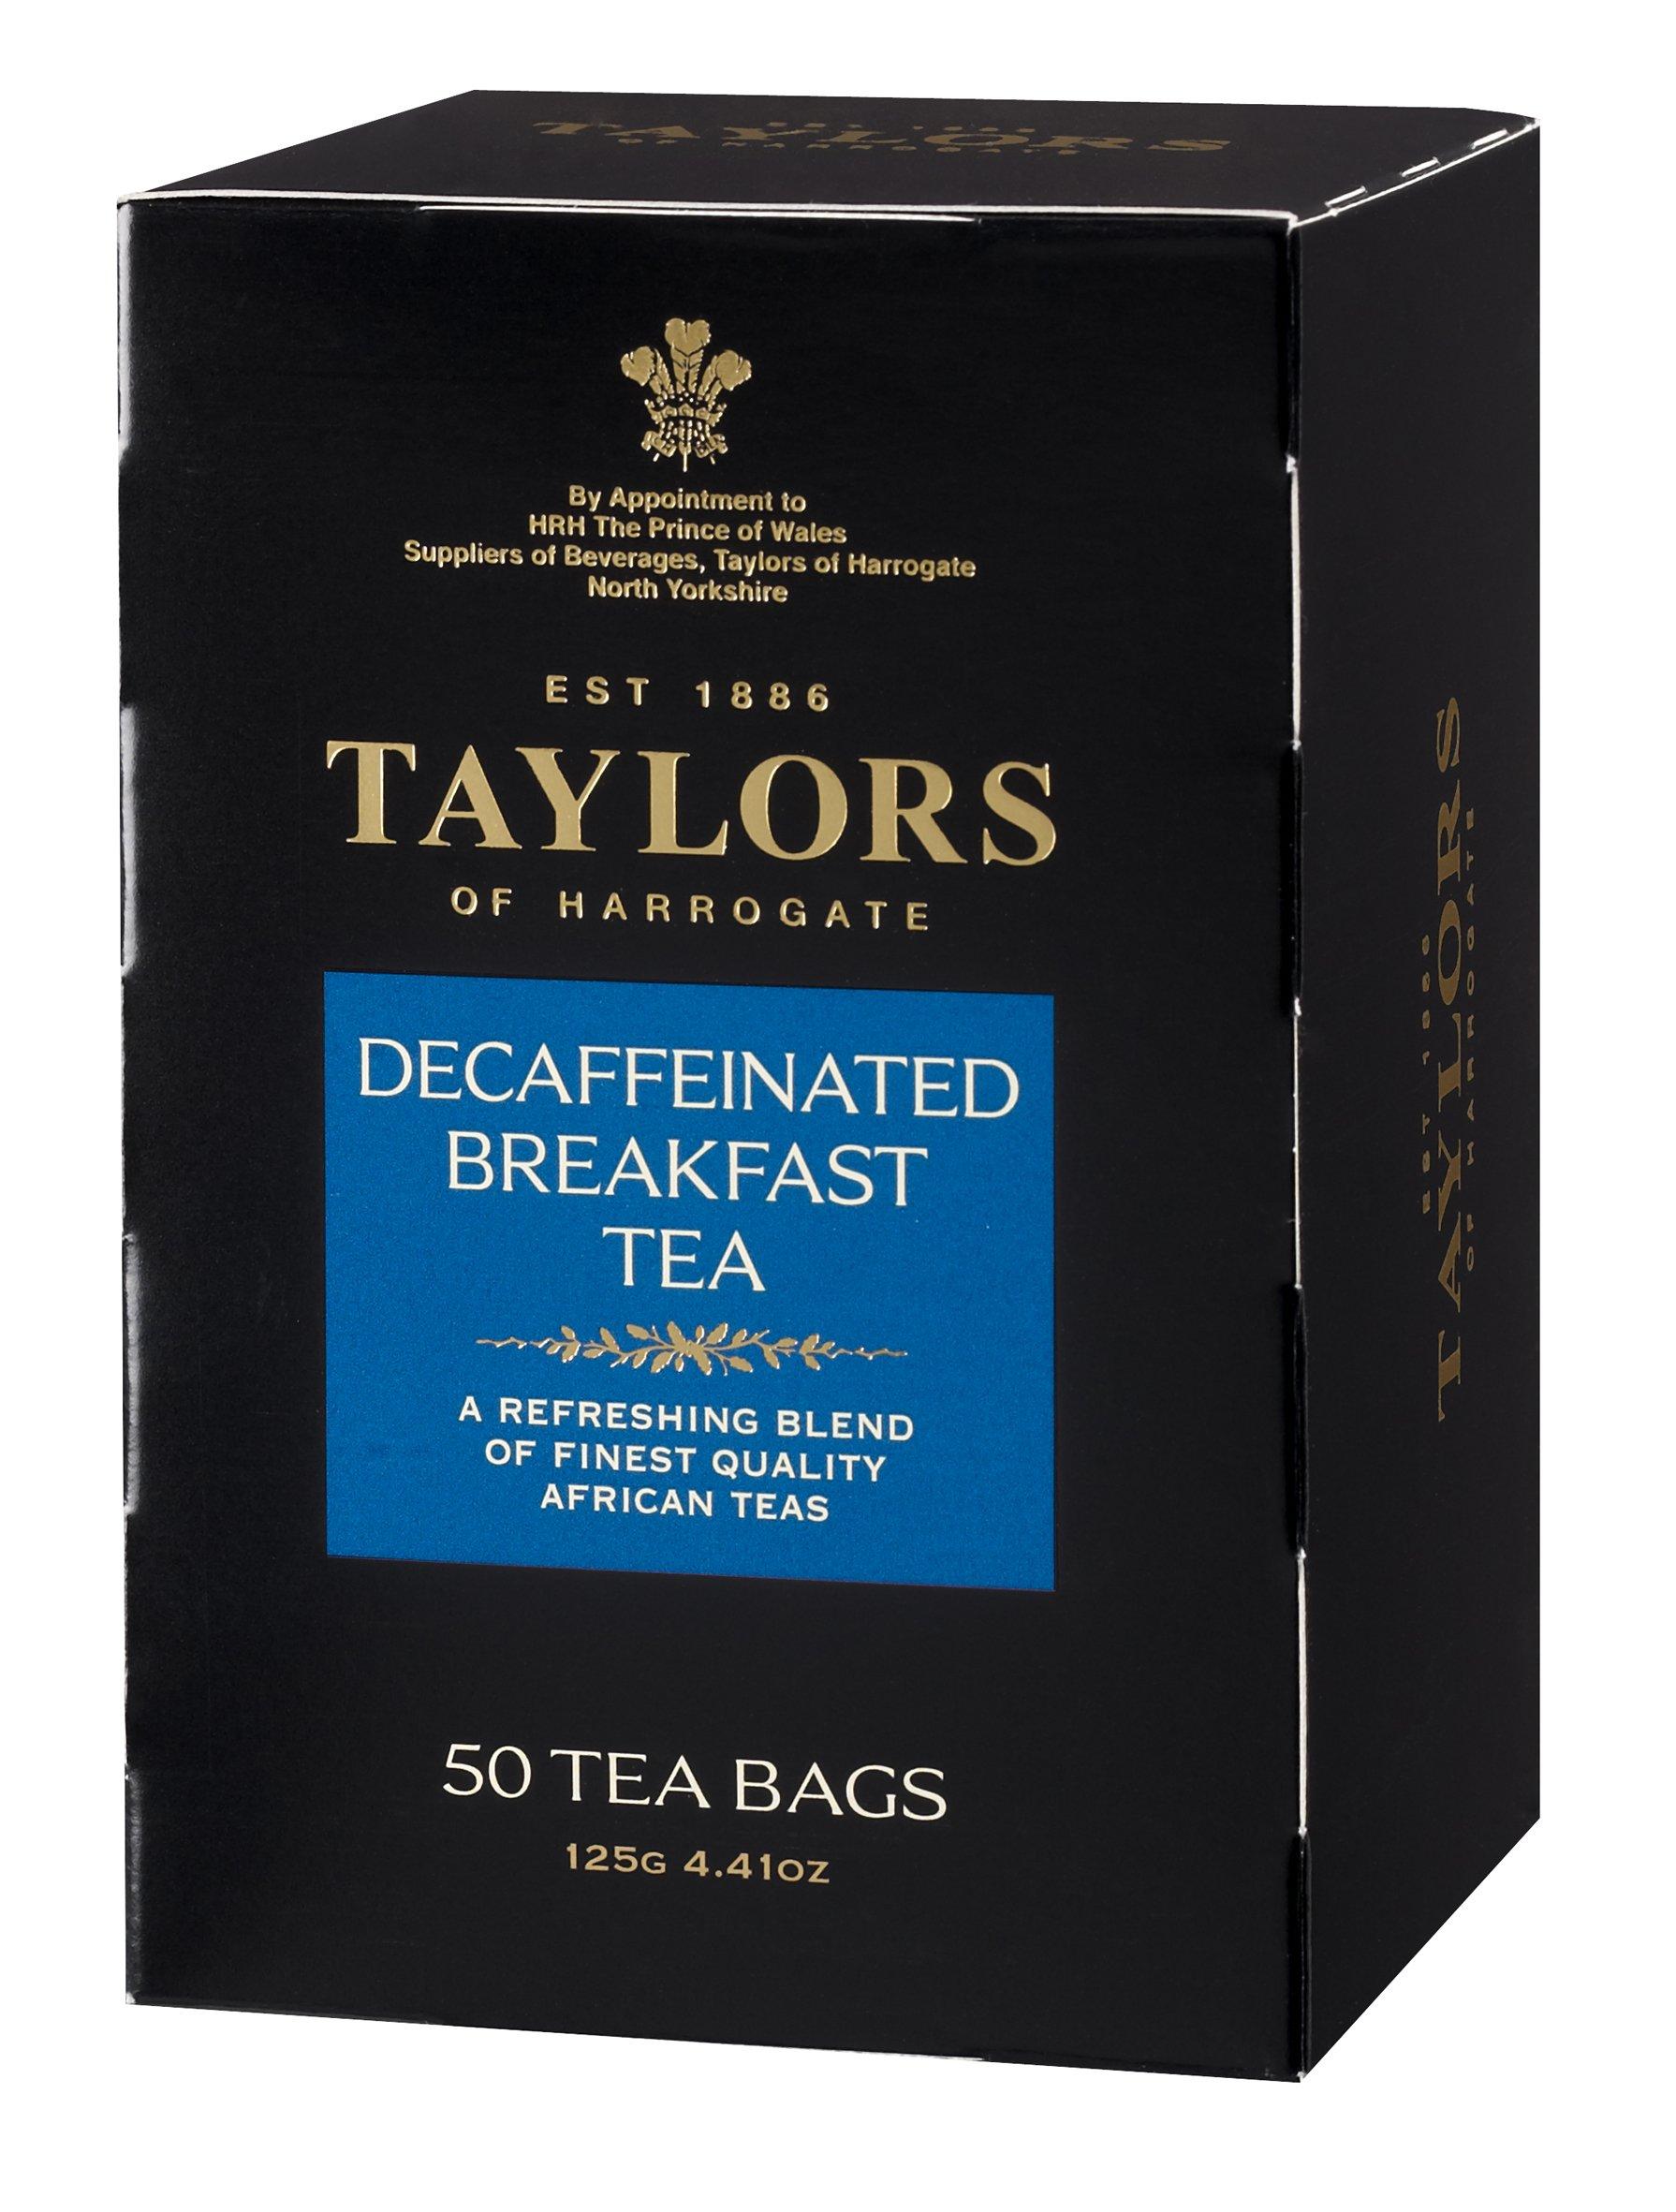 Taylors of Harrogate Decaffeinated Breakfast, 50 Teabags